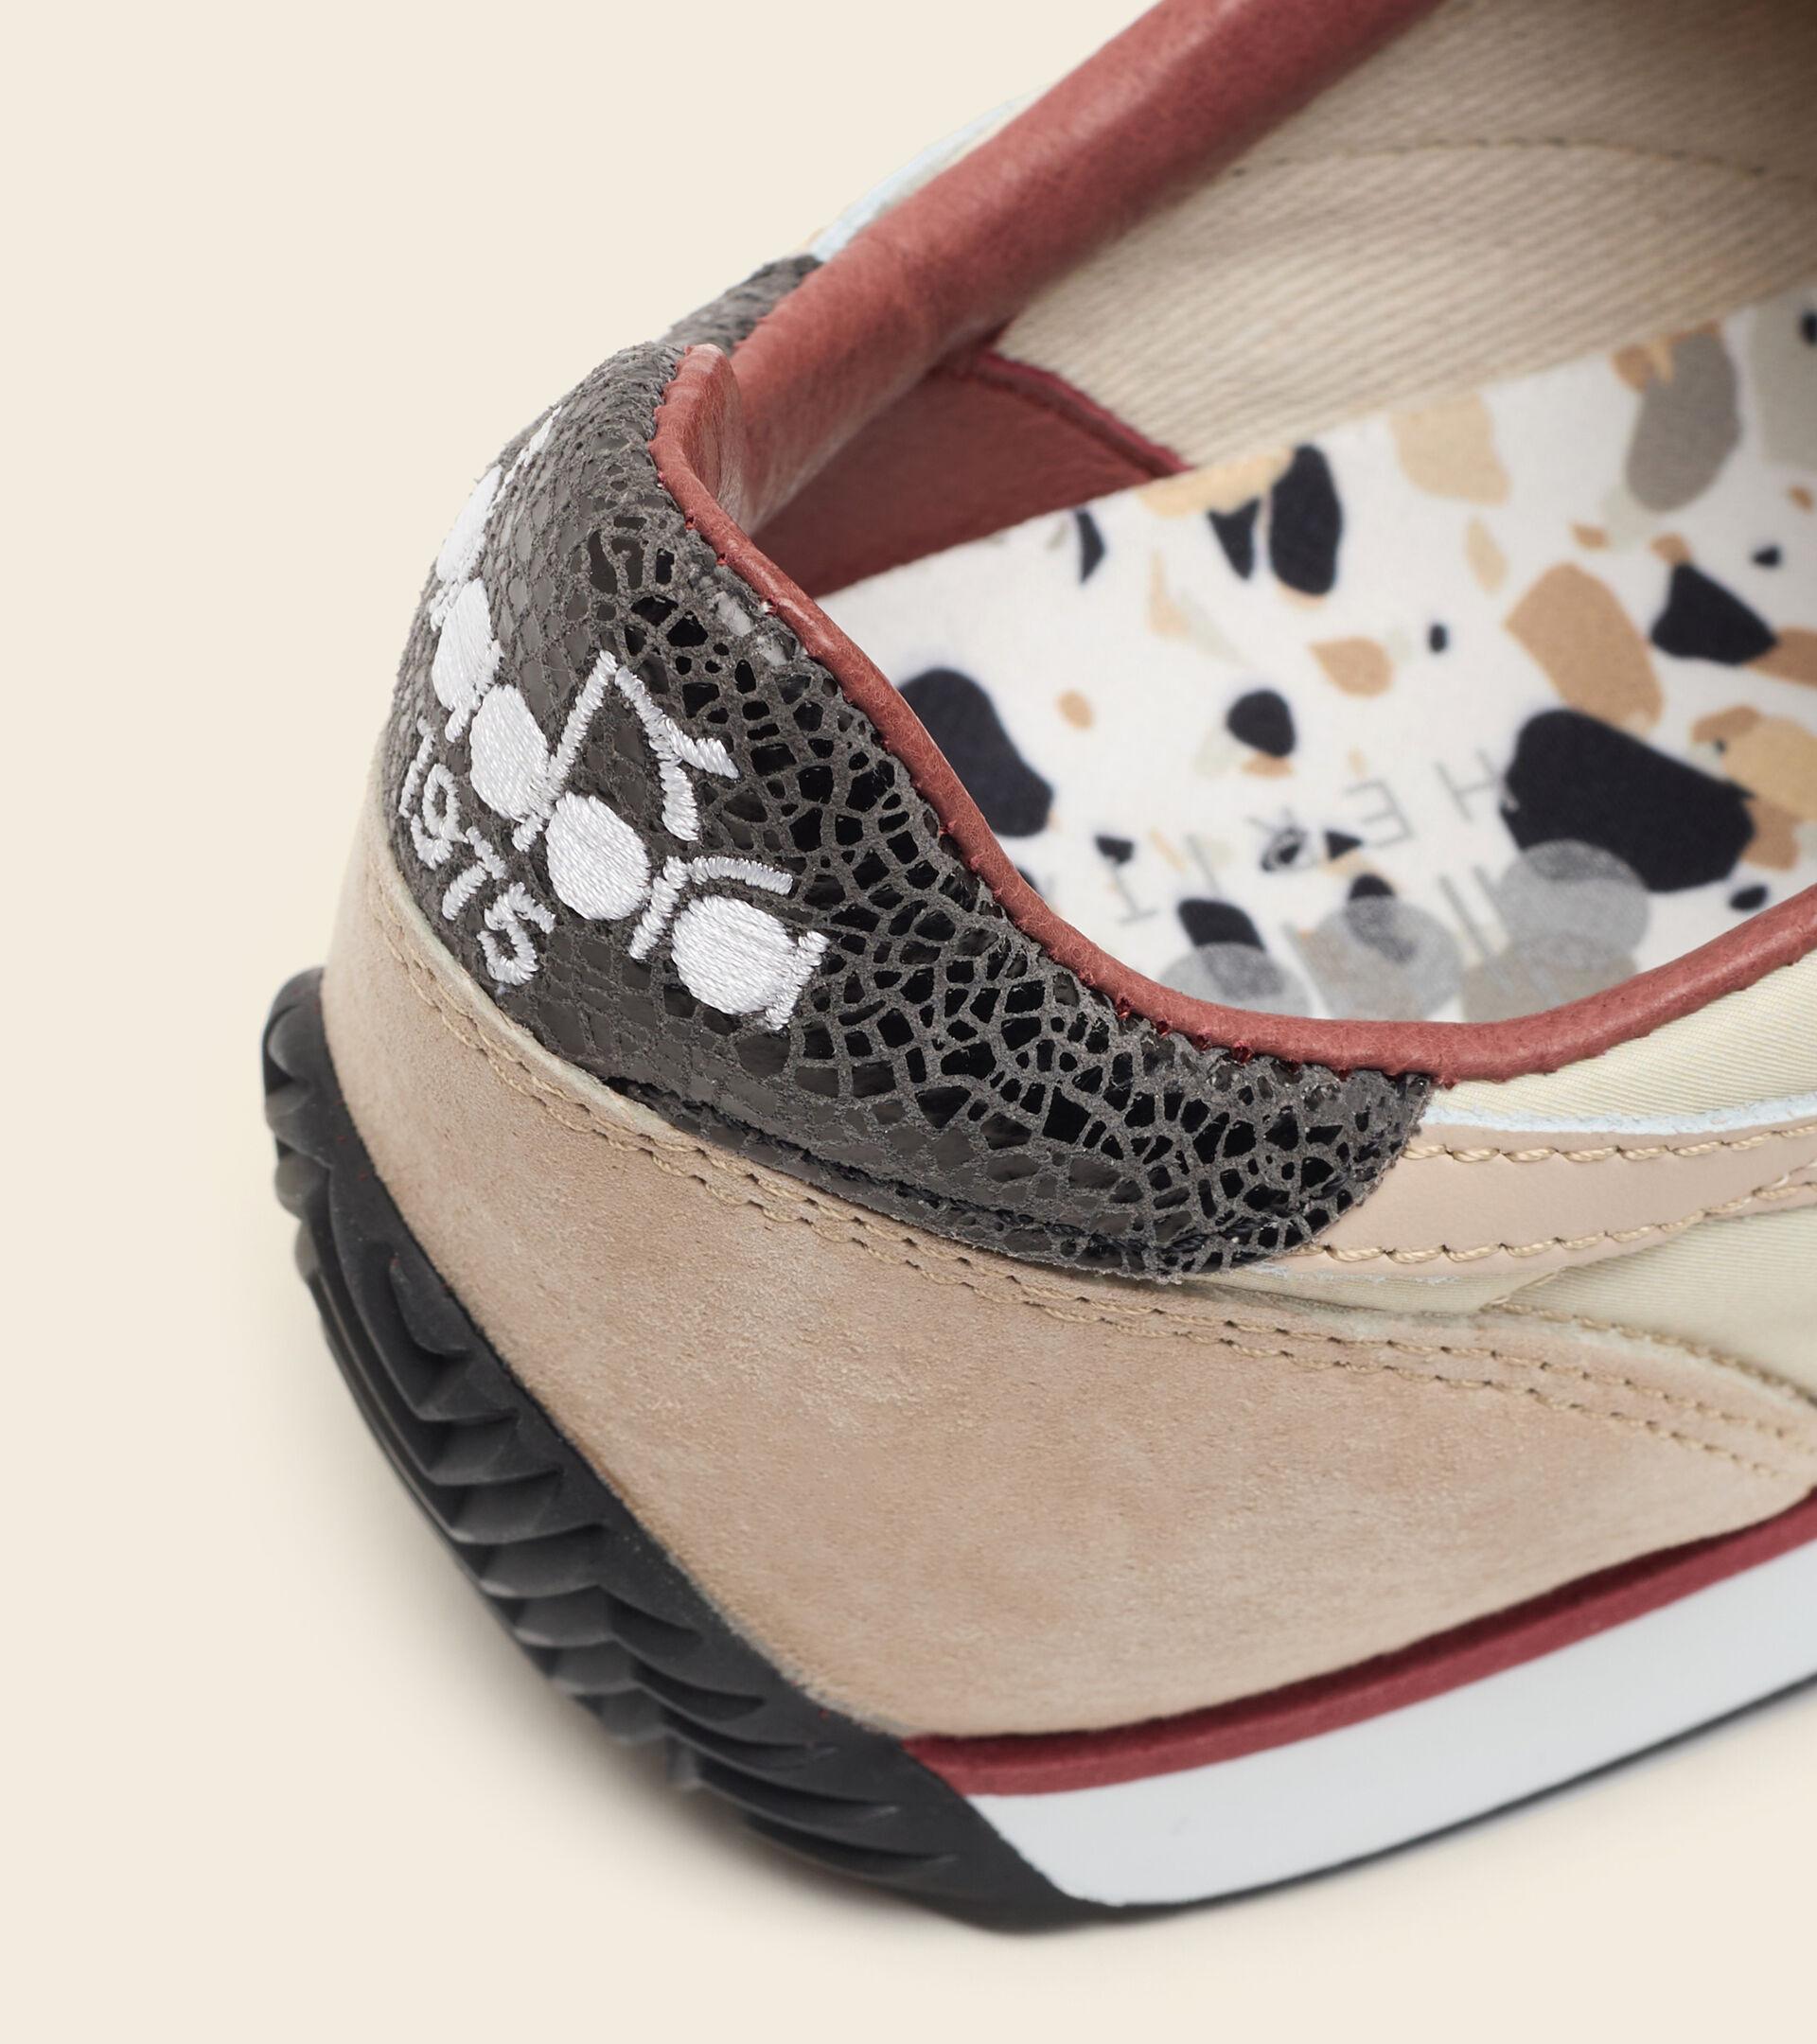 Footwear Heritage UOMO EQUIPE ITALIA BEIGE OYSTER (25036) Diadora